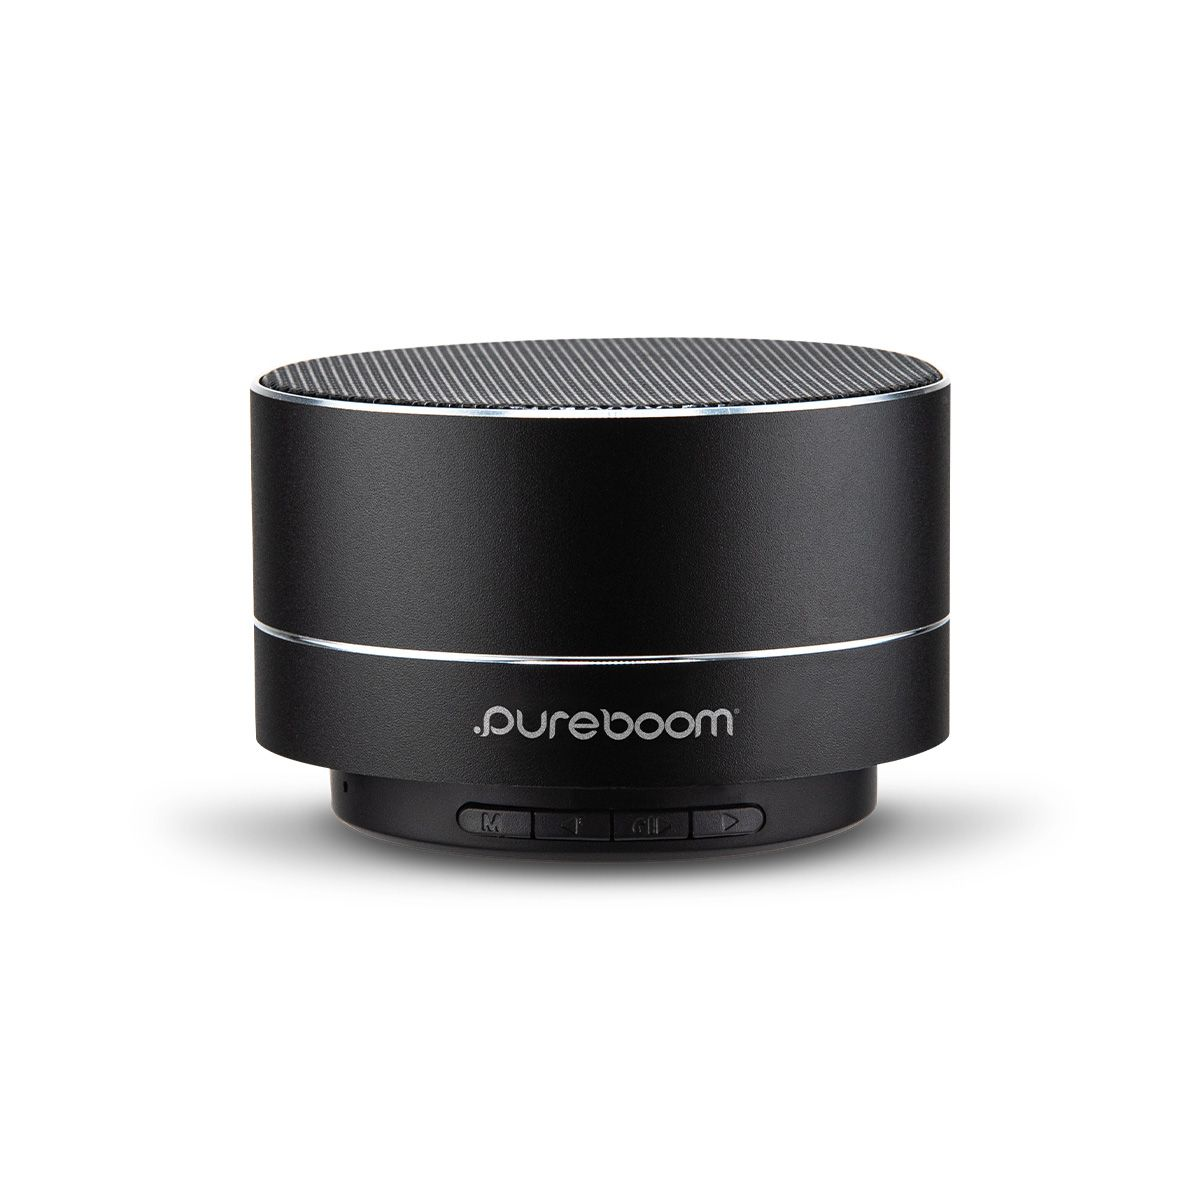 PureBoom Mini Wireless Speaker - Black